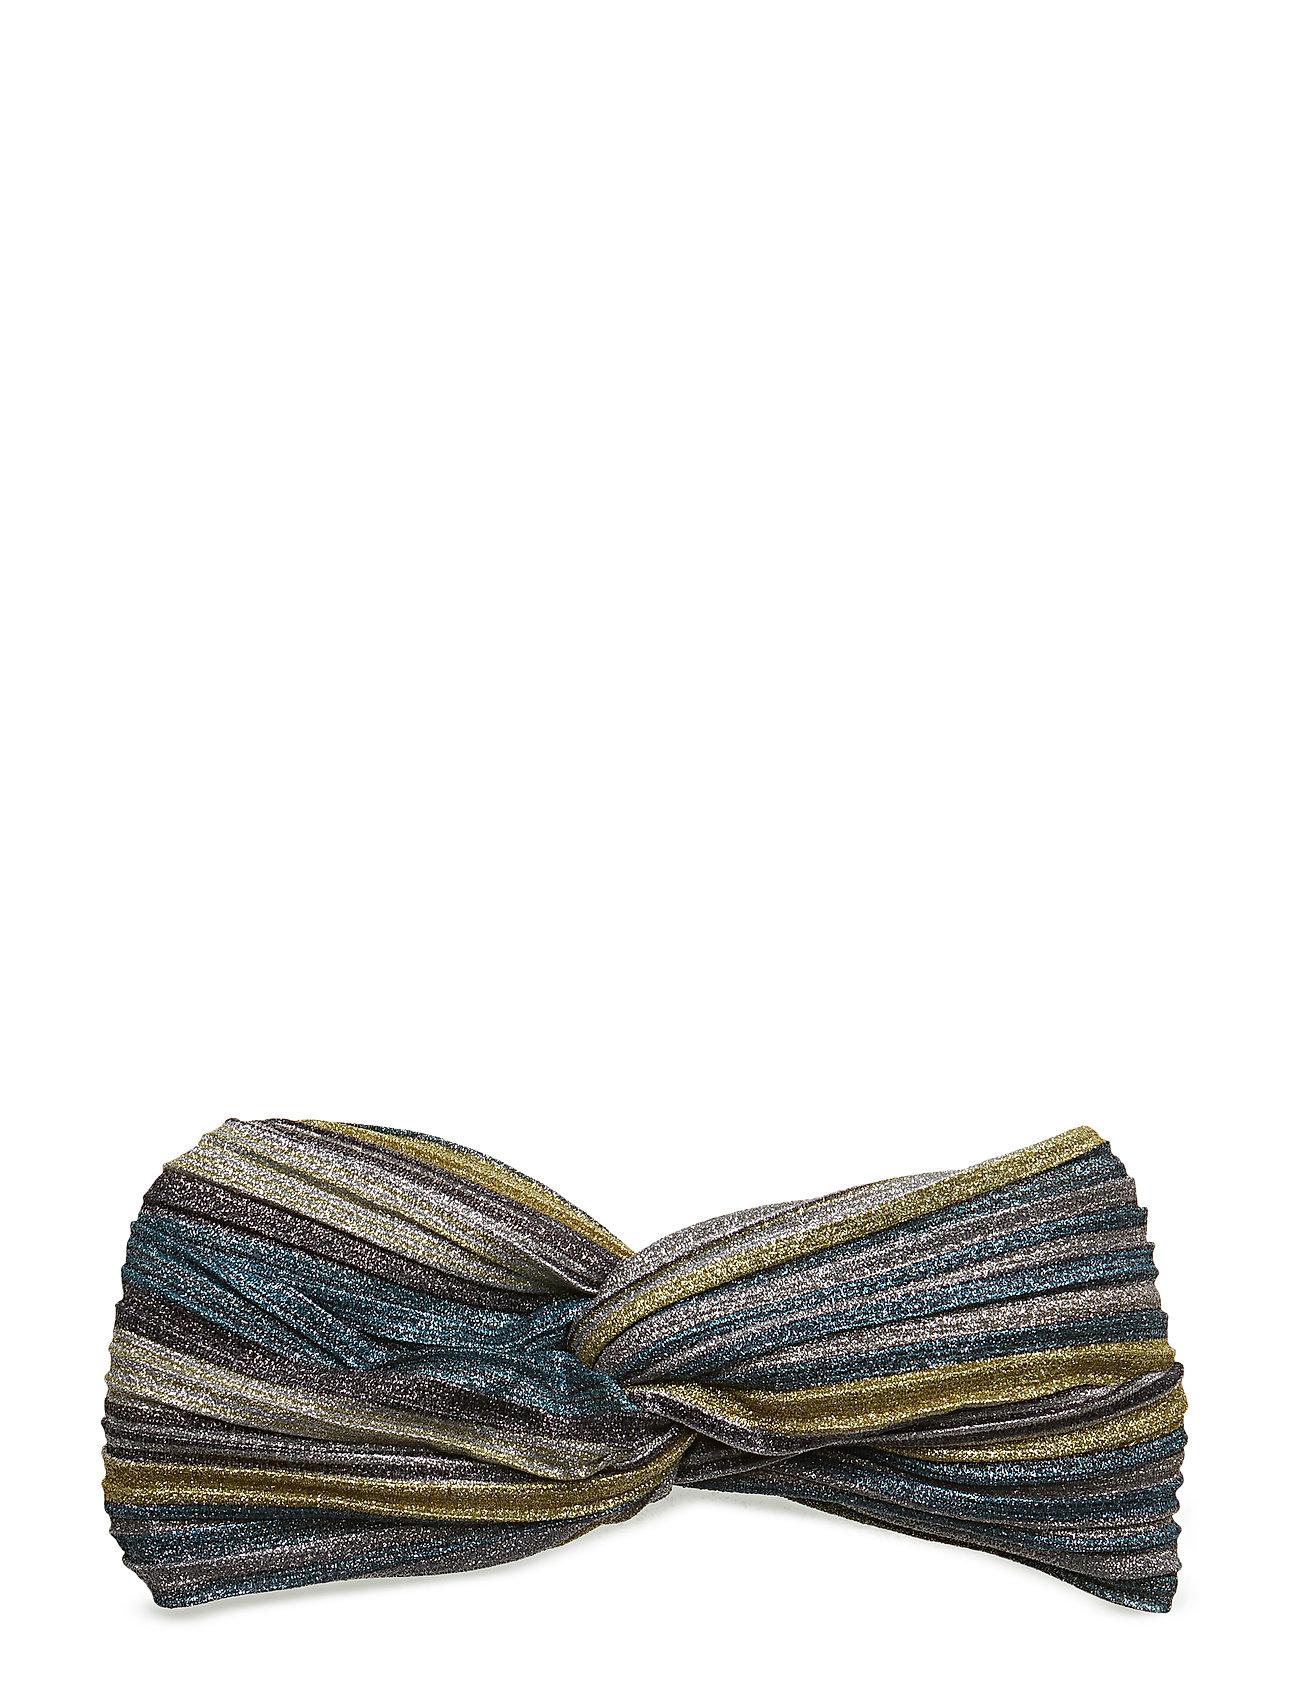 Image of Hairband Glittery (3115786955)